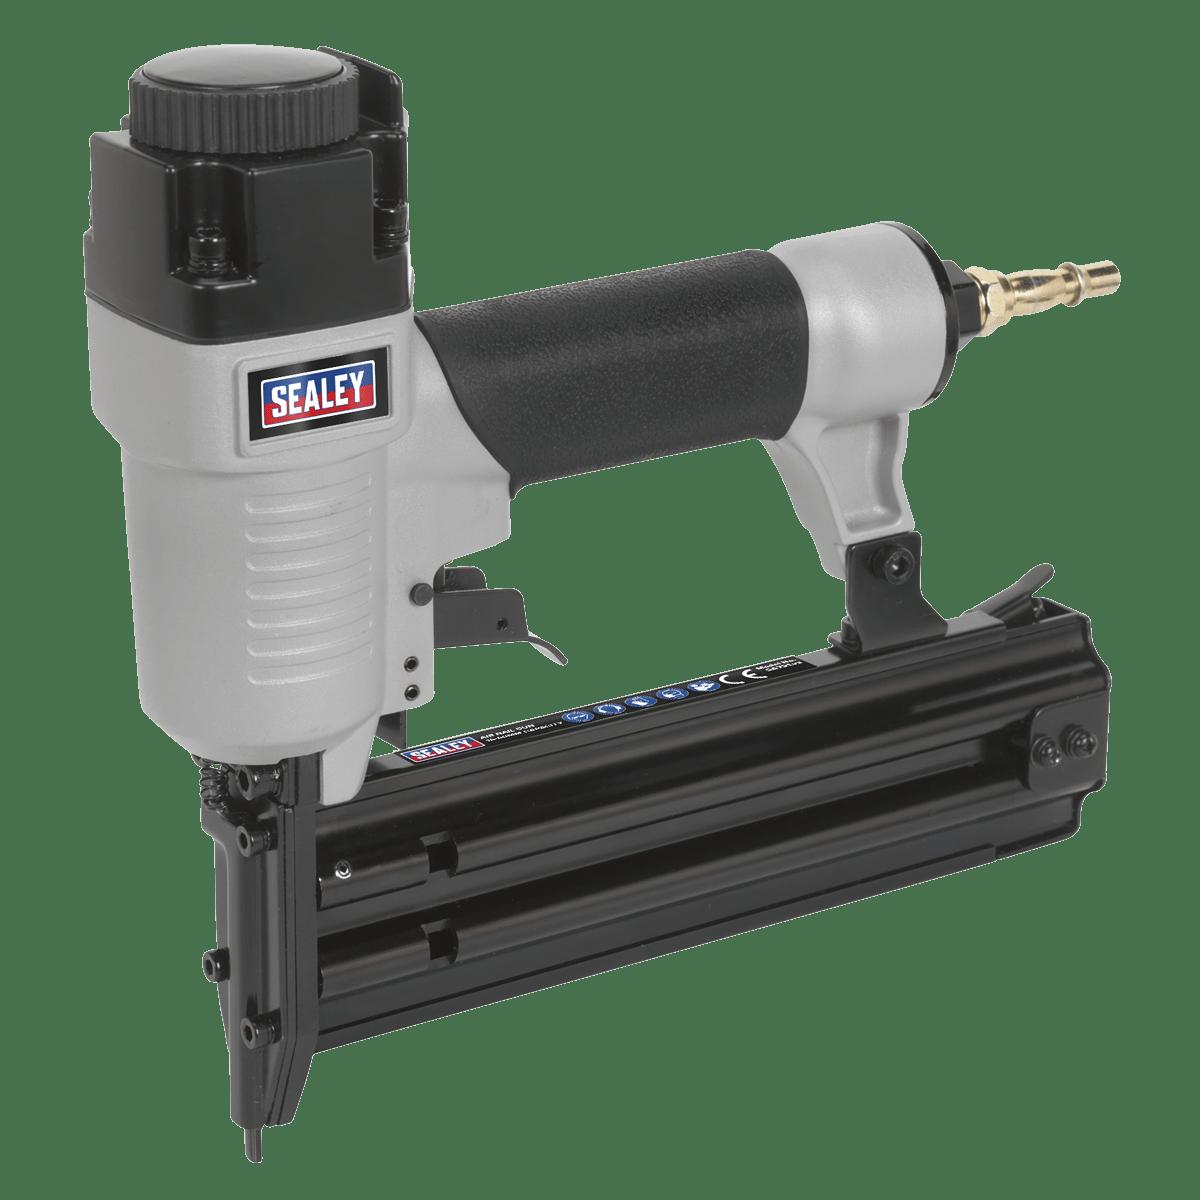 Sealey Air Nail Gun 10-50mm Capacity SA791   Professional air nail gun with lightweight aluminium body and rubber grip handle.   toolforce.ie